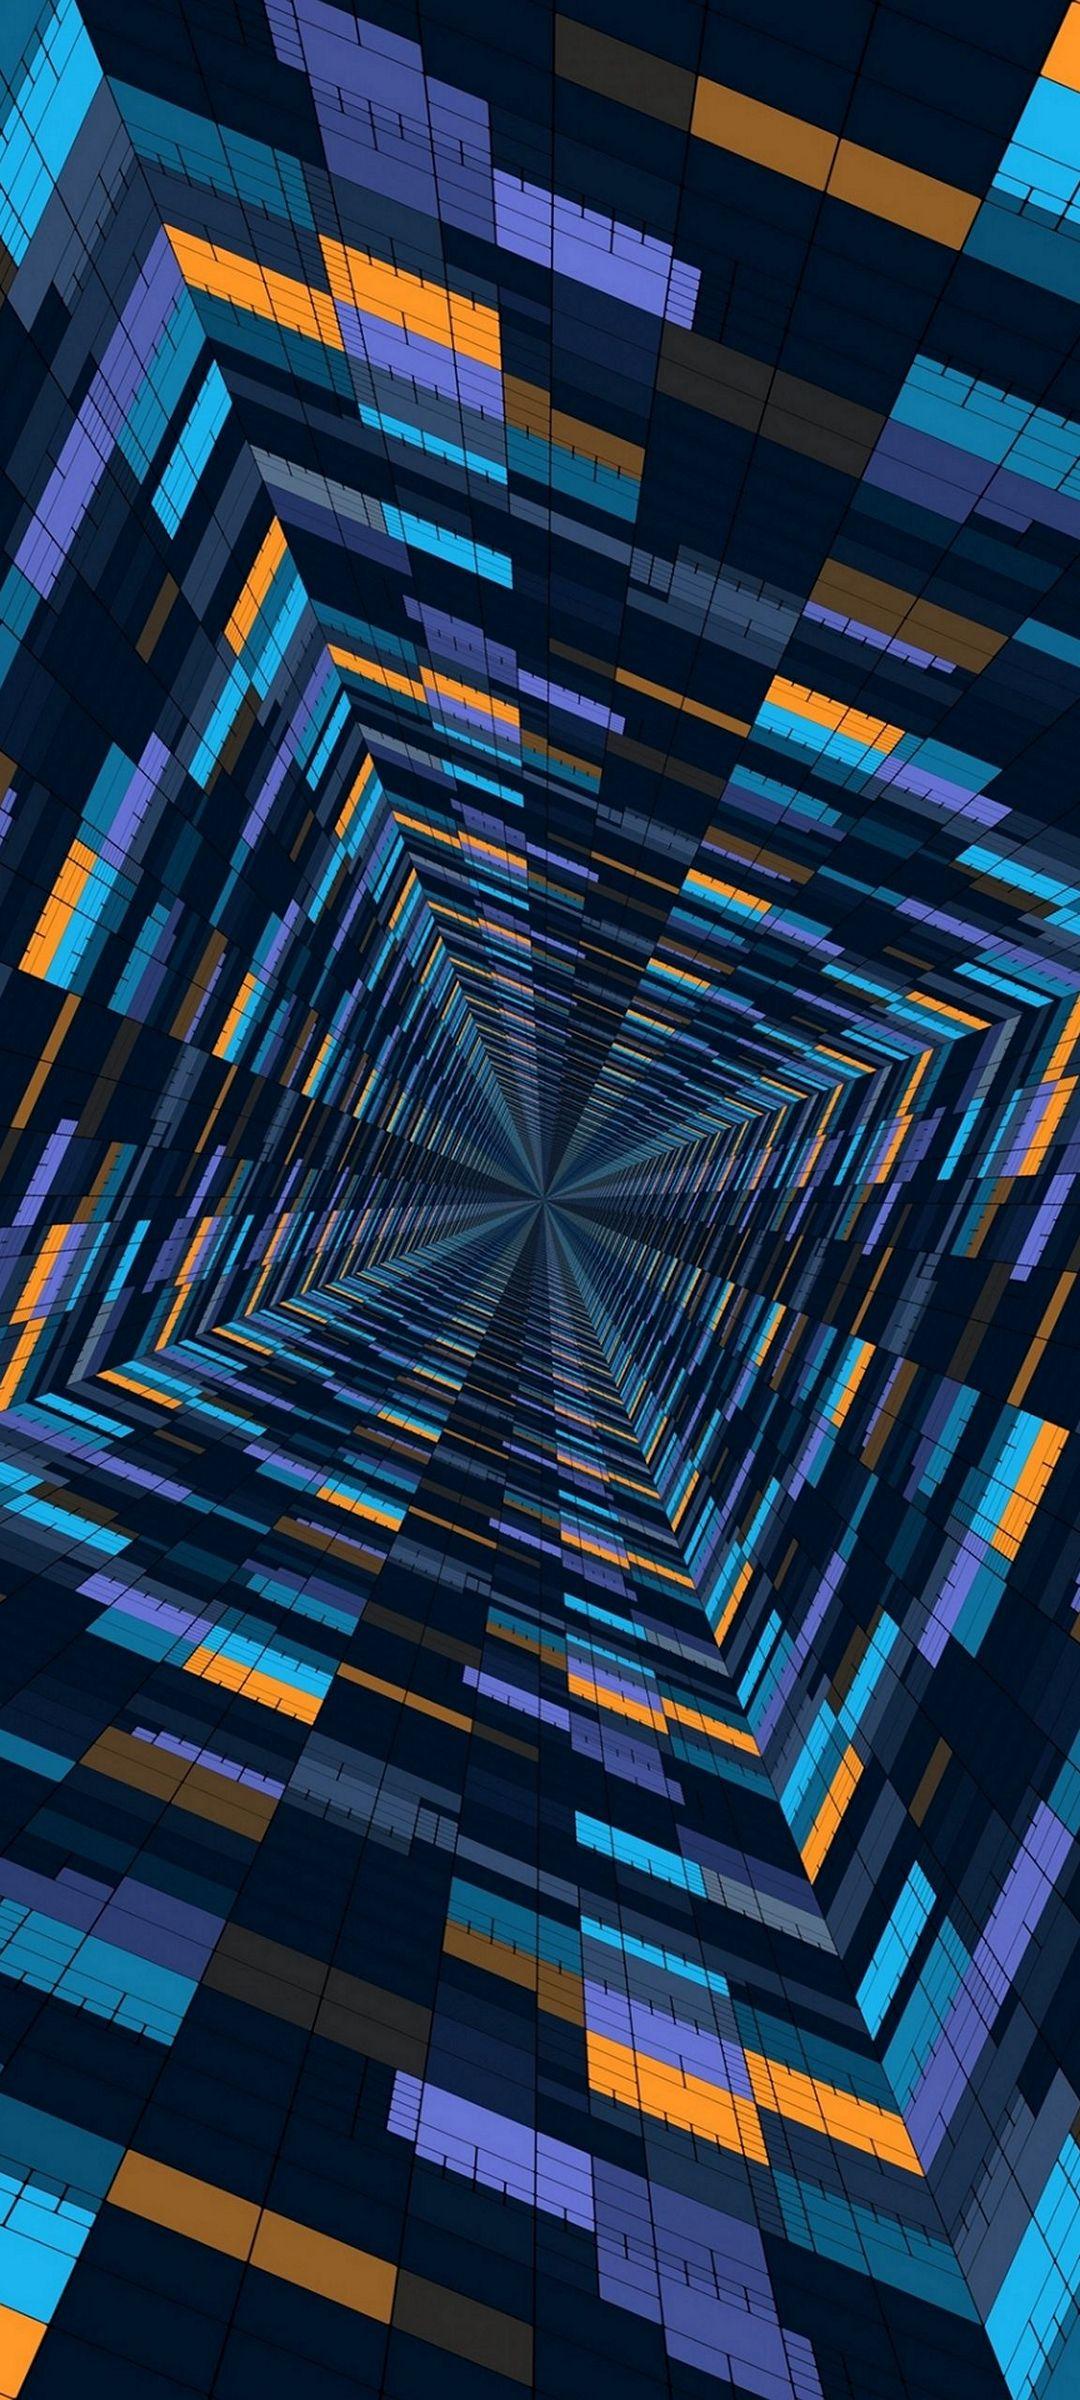 Abstract 3D Blocks